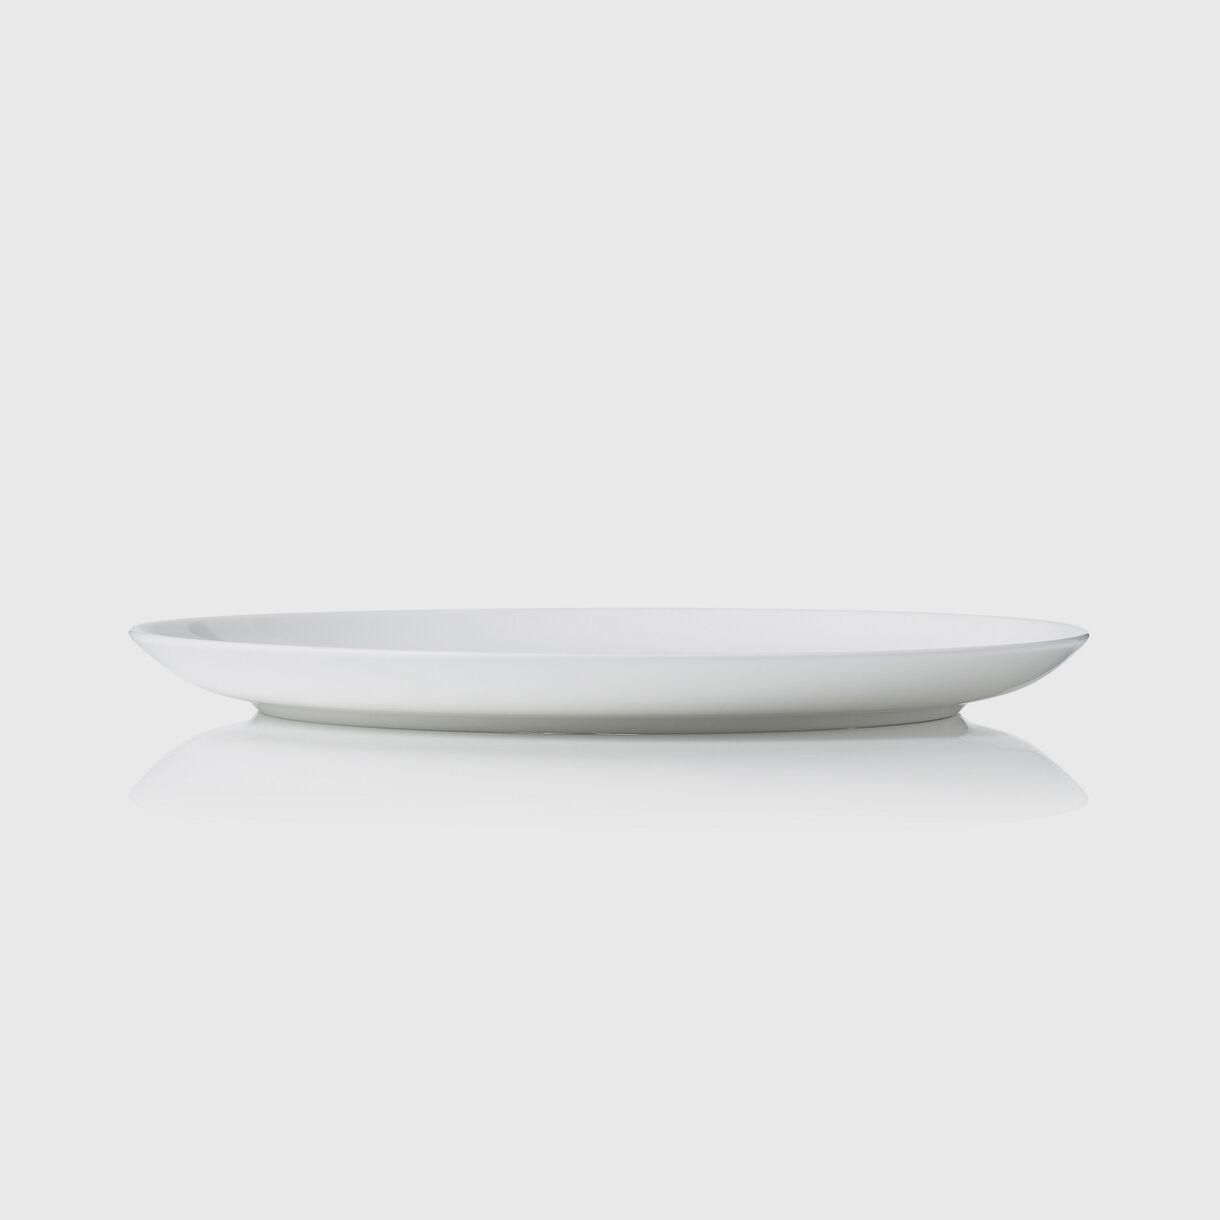 David Caon by Noritake Dinner Plate